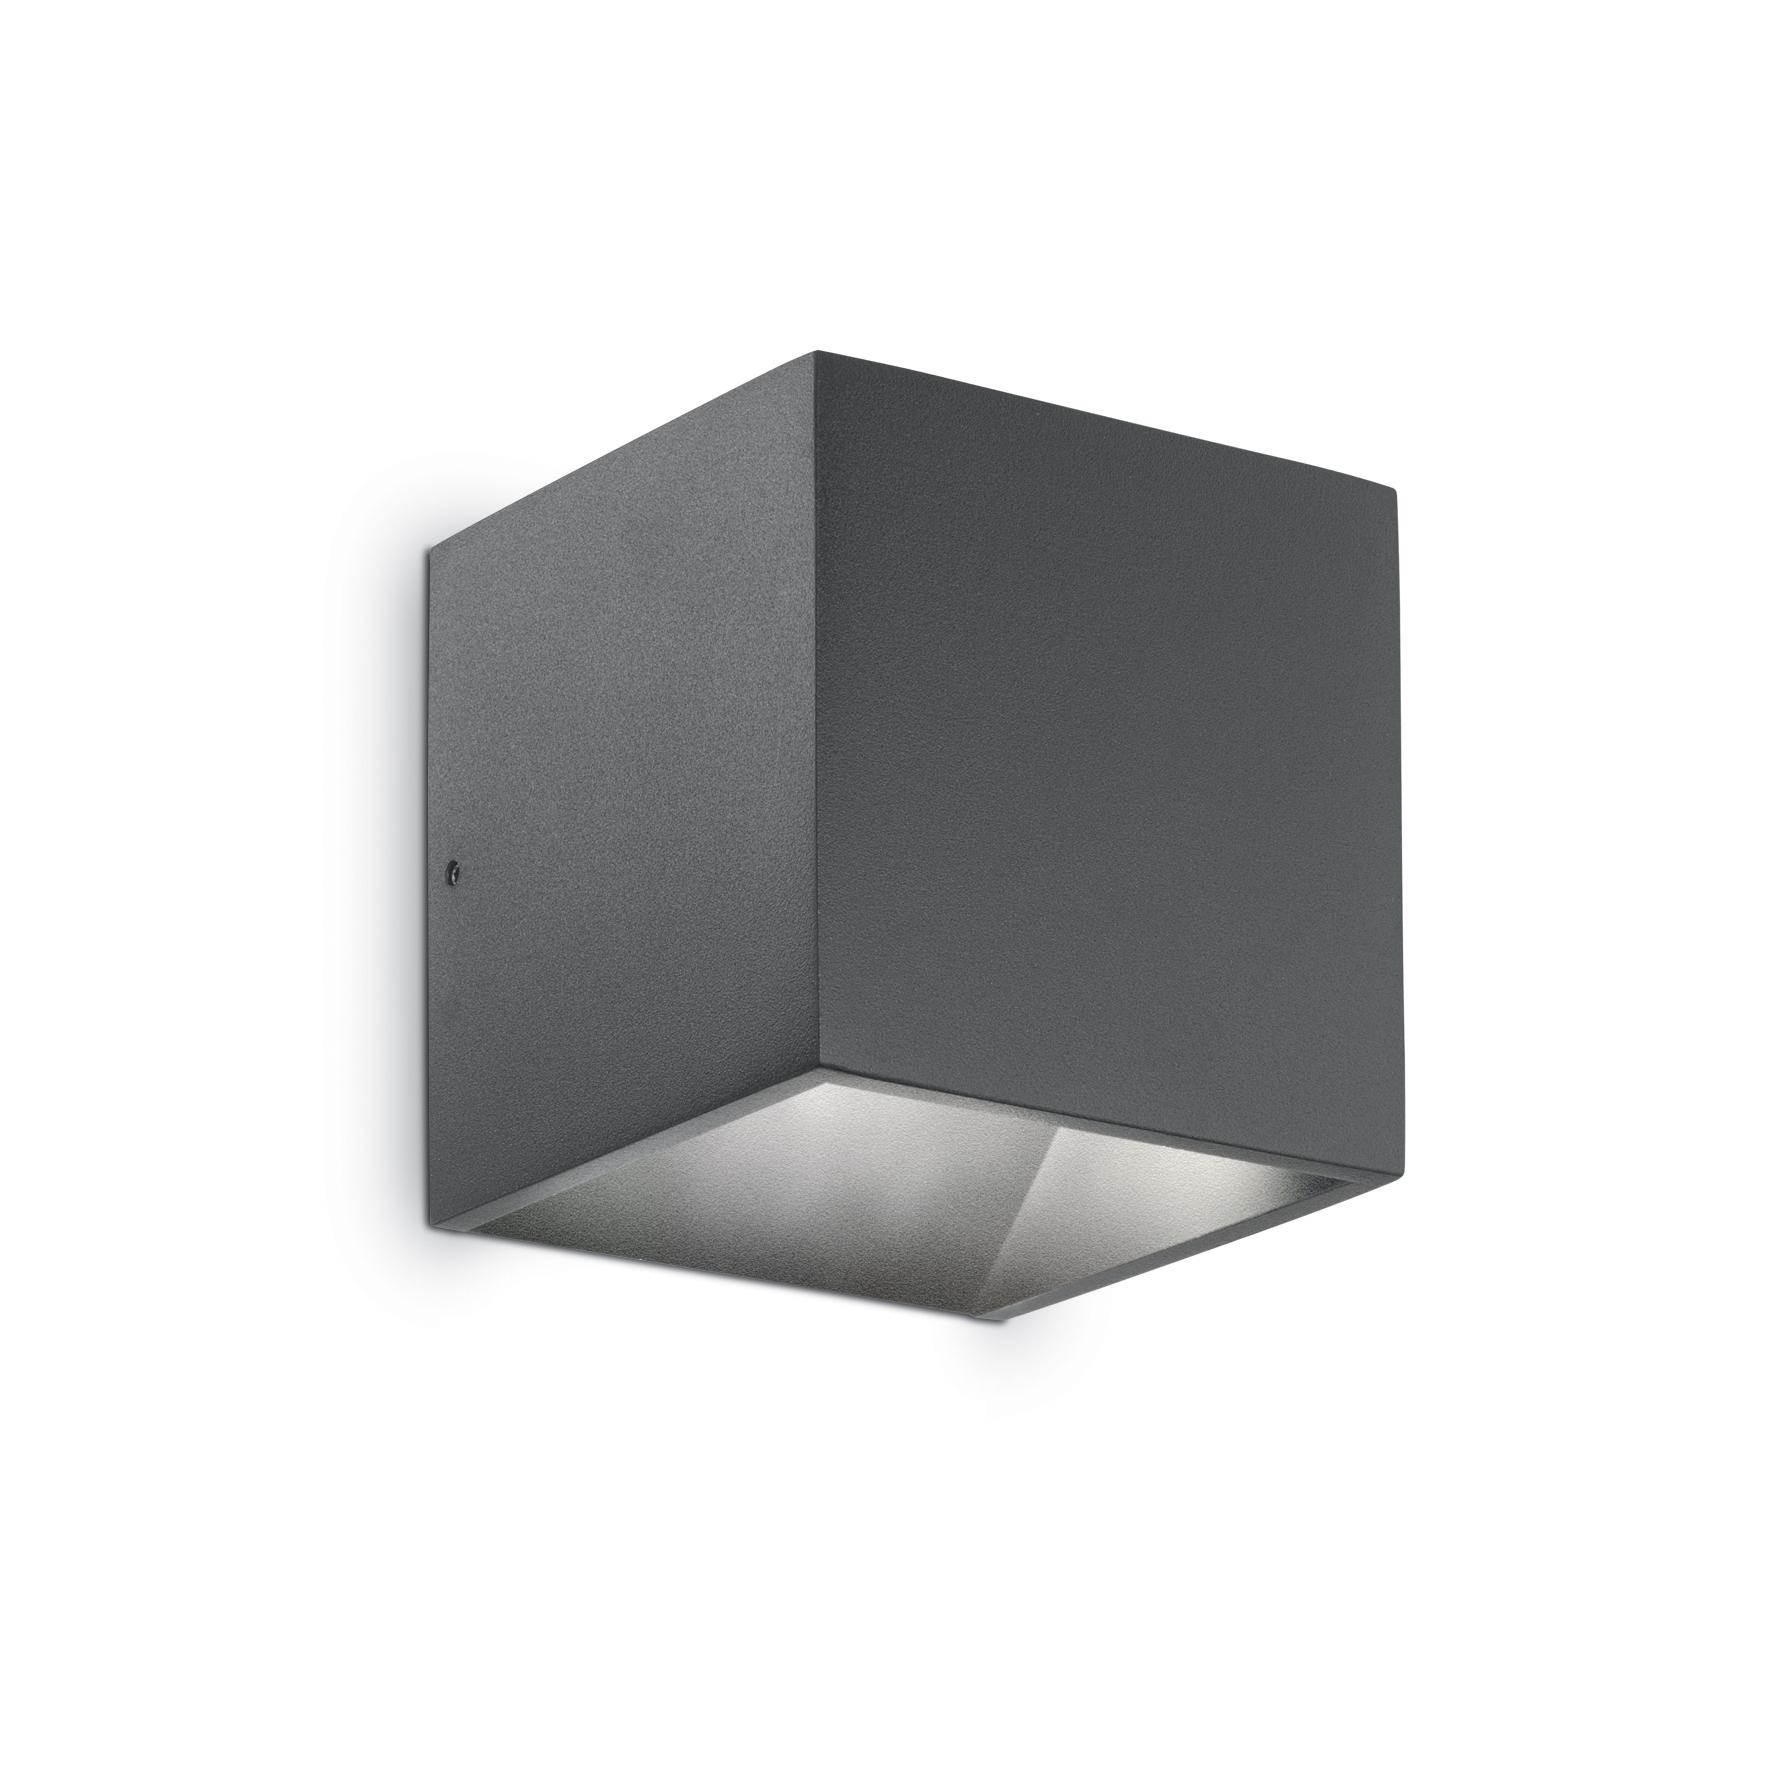 Aplica Rubik AP1 Anthracite